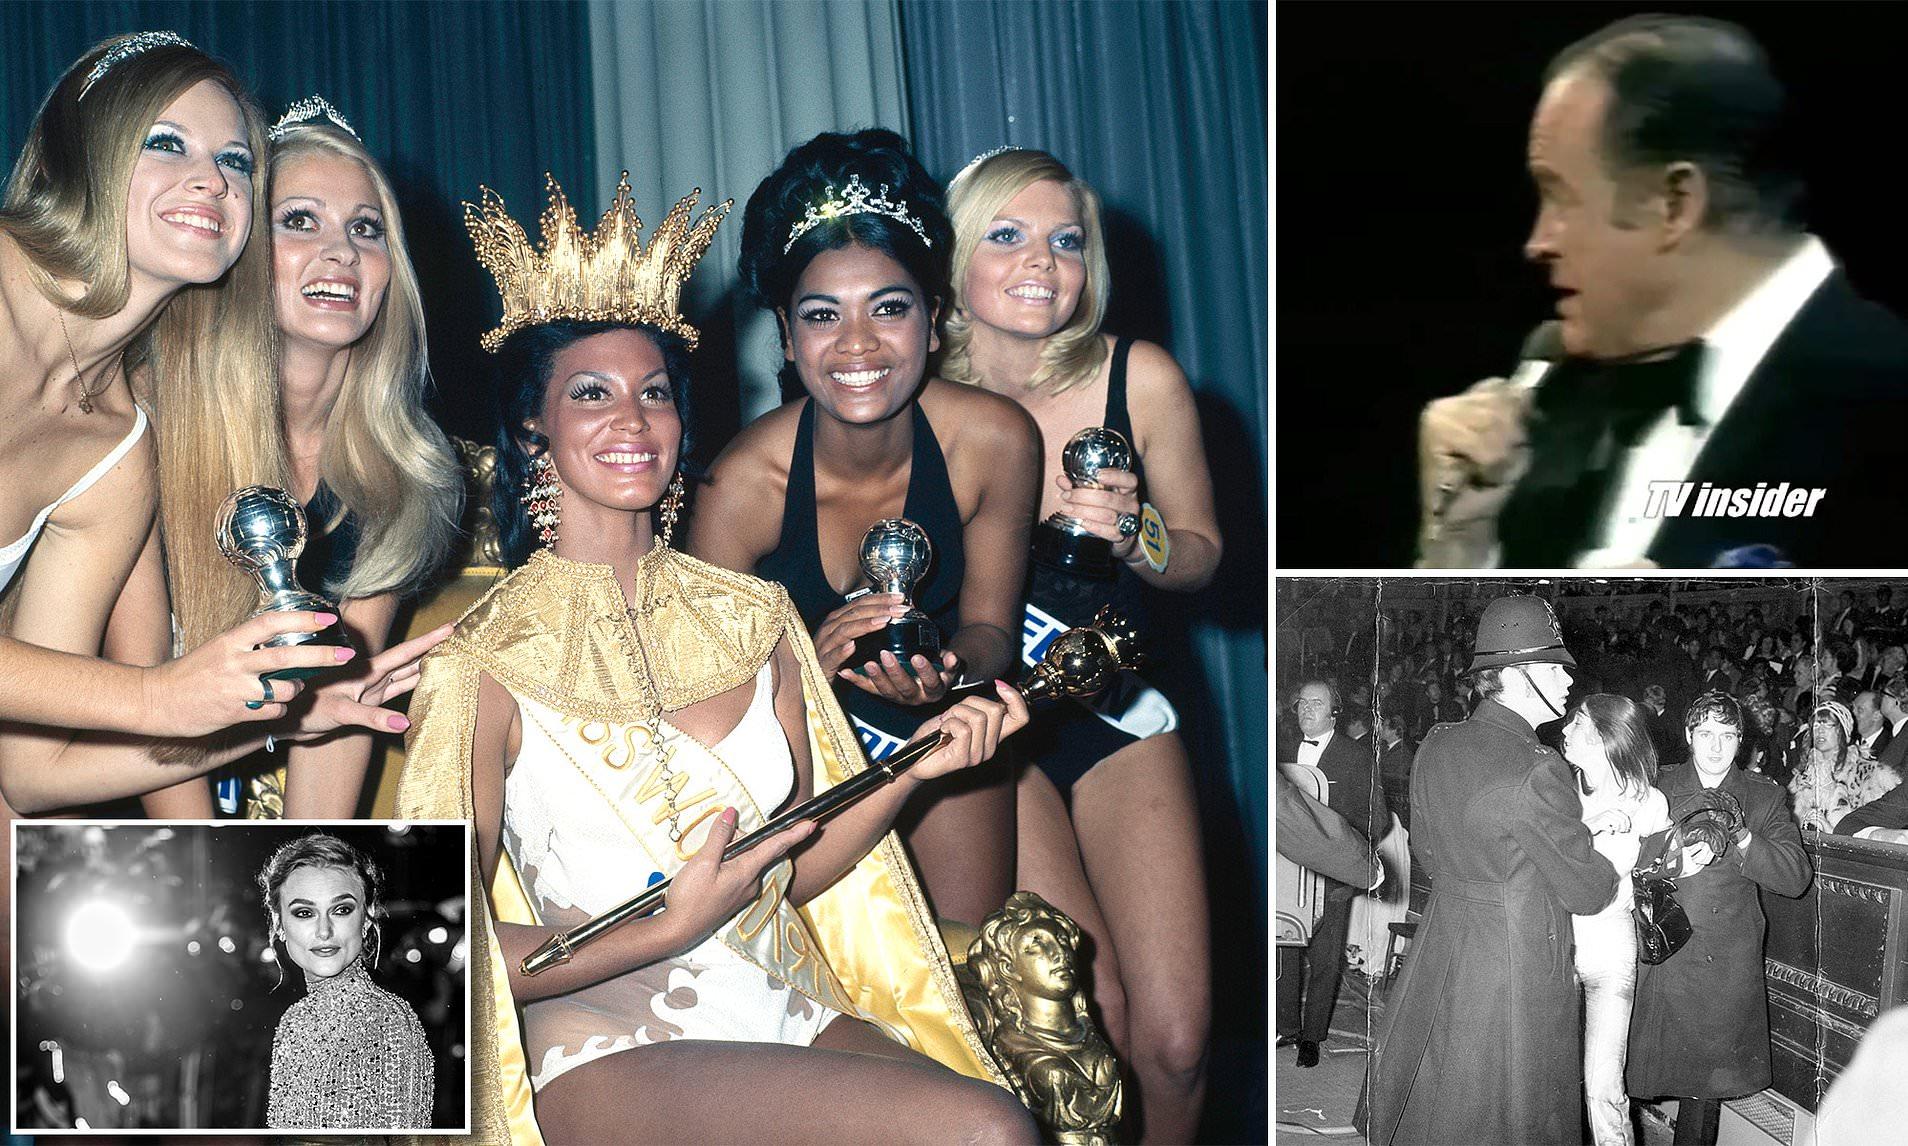 Candid junior nudist pageants